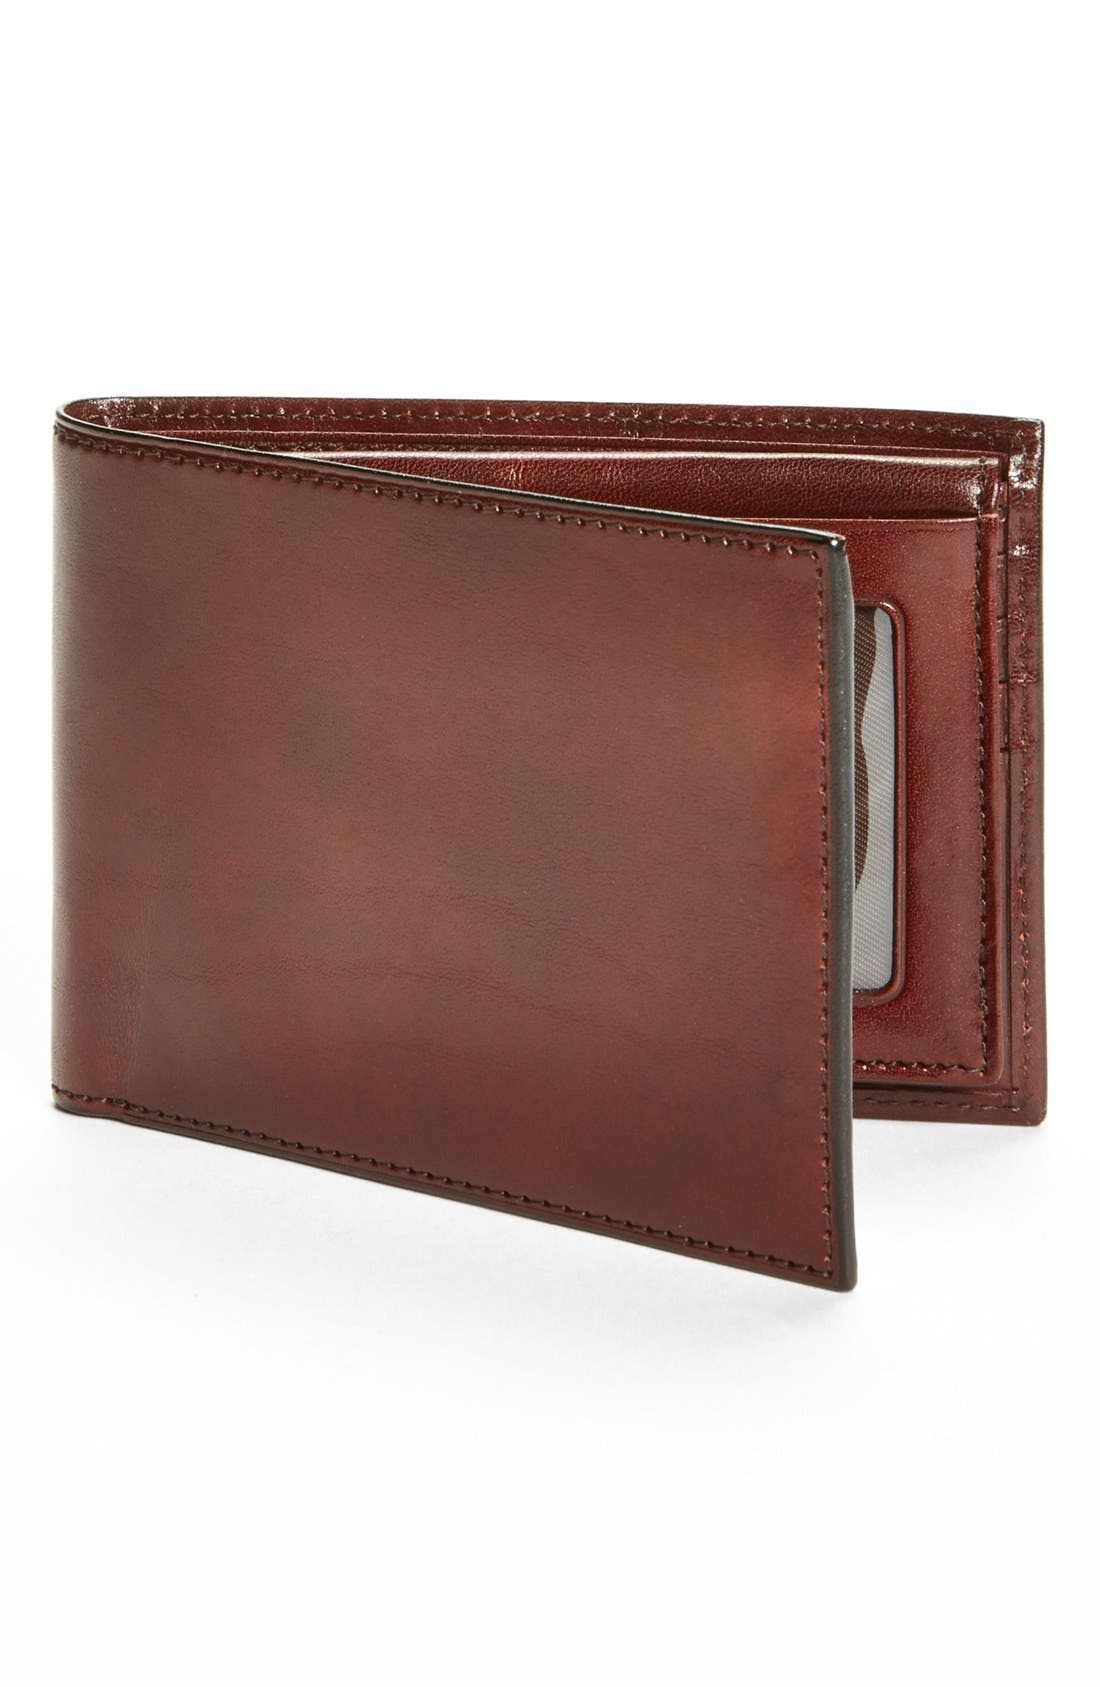 Main Image - Bosca ID Passcase Wallet